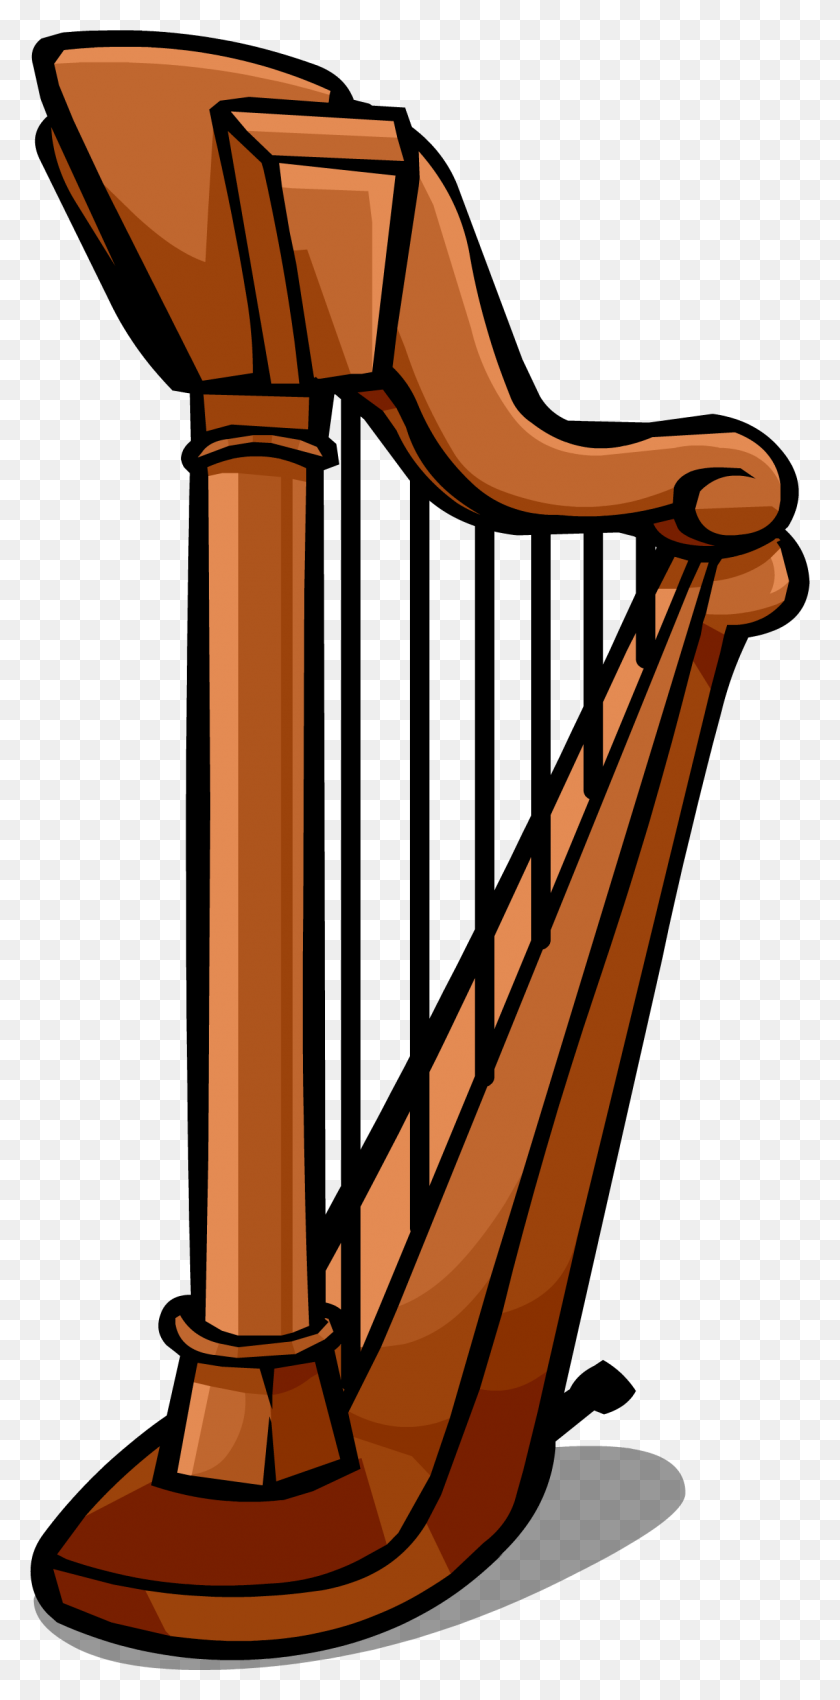 Image - Harp PNG